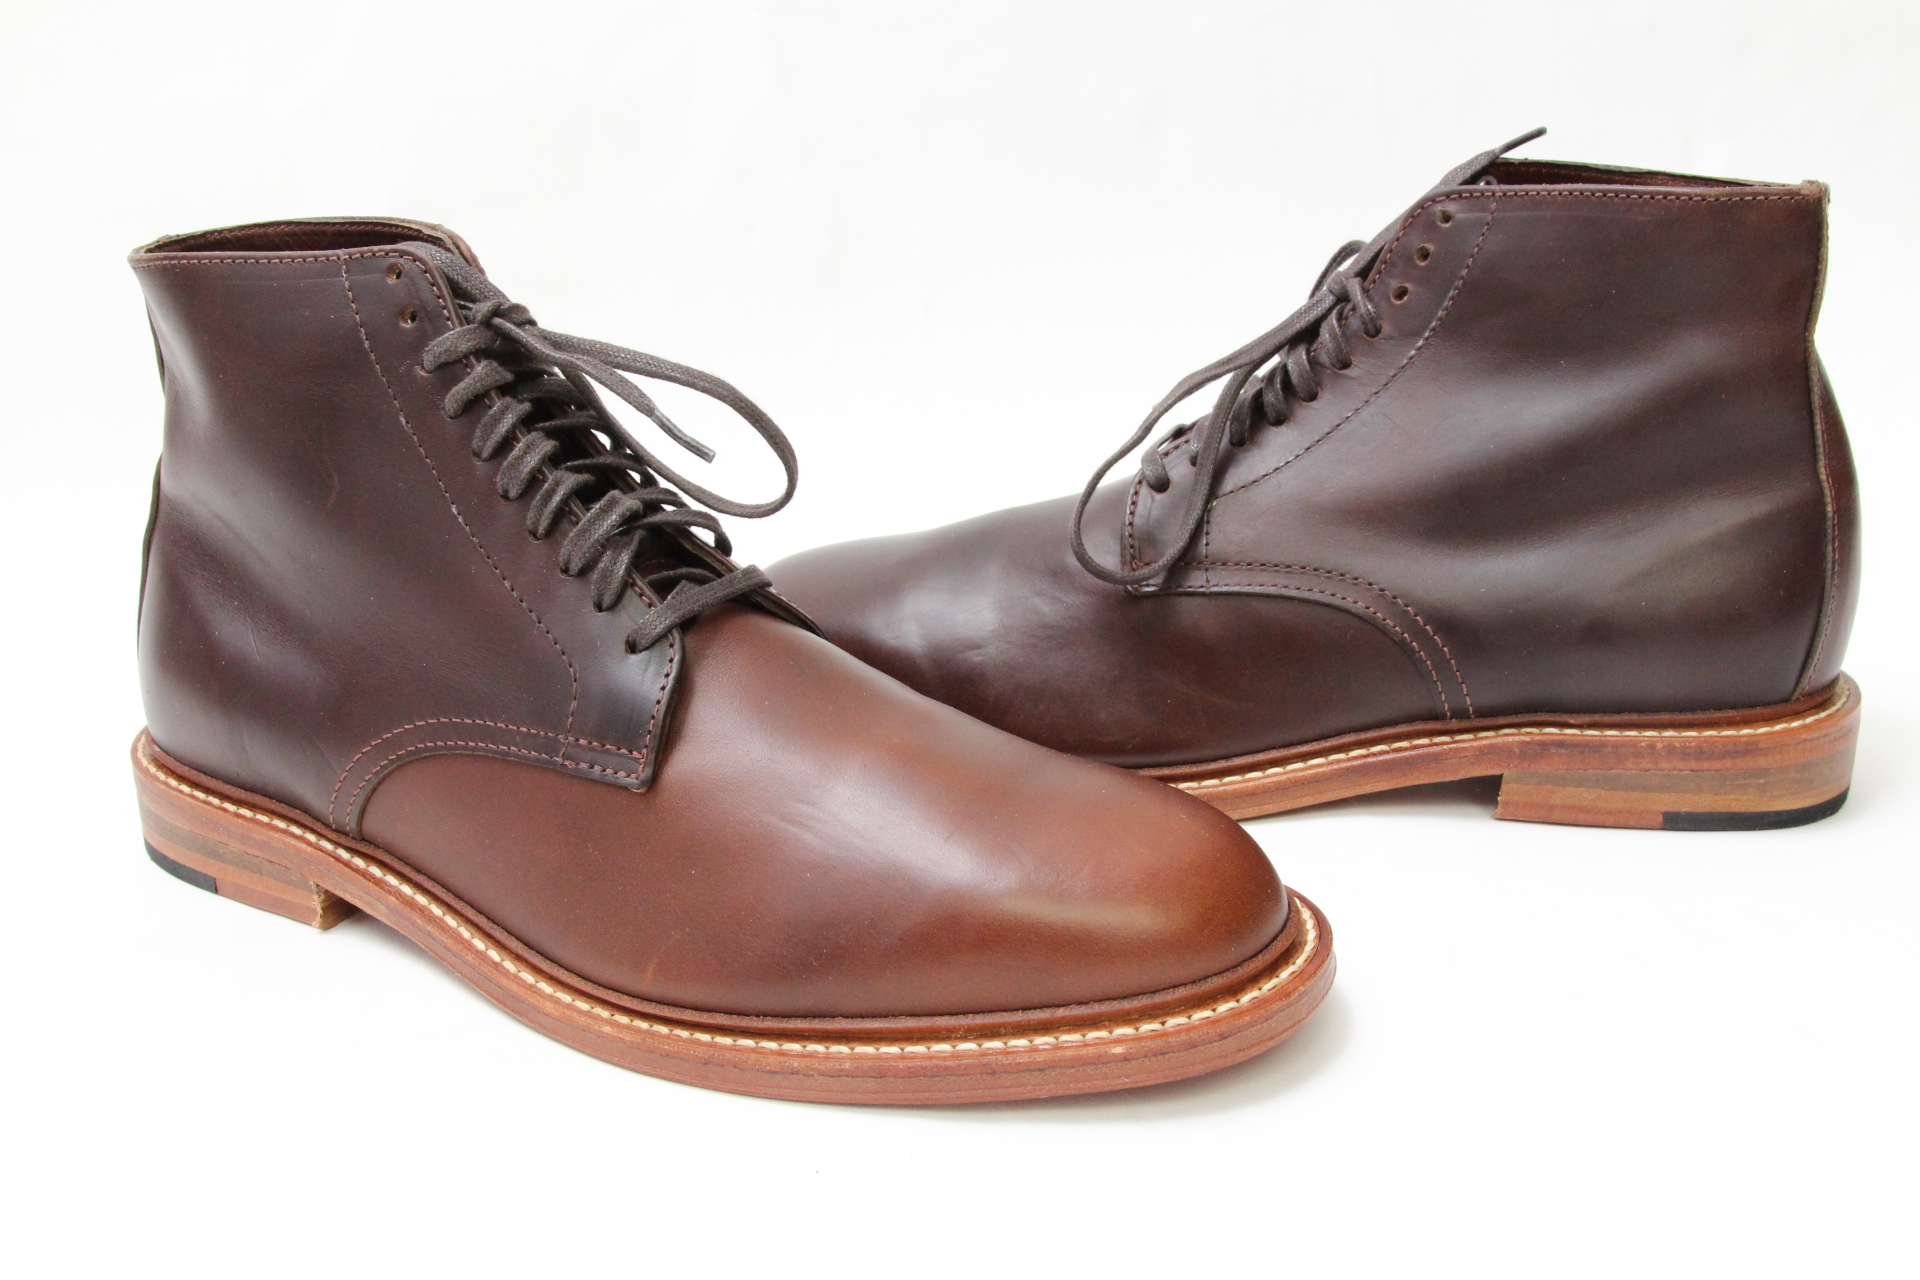 Greenfield Shoe Store